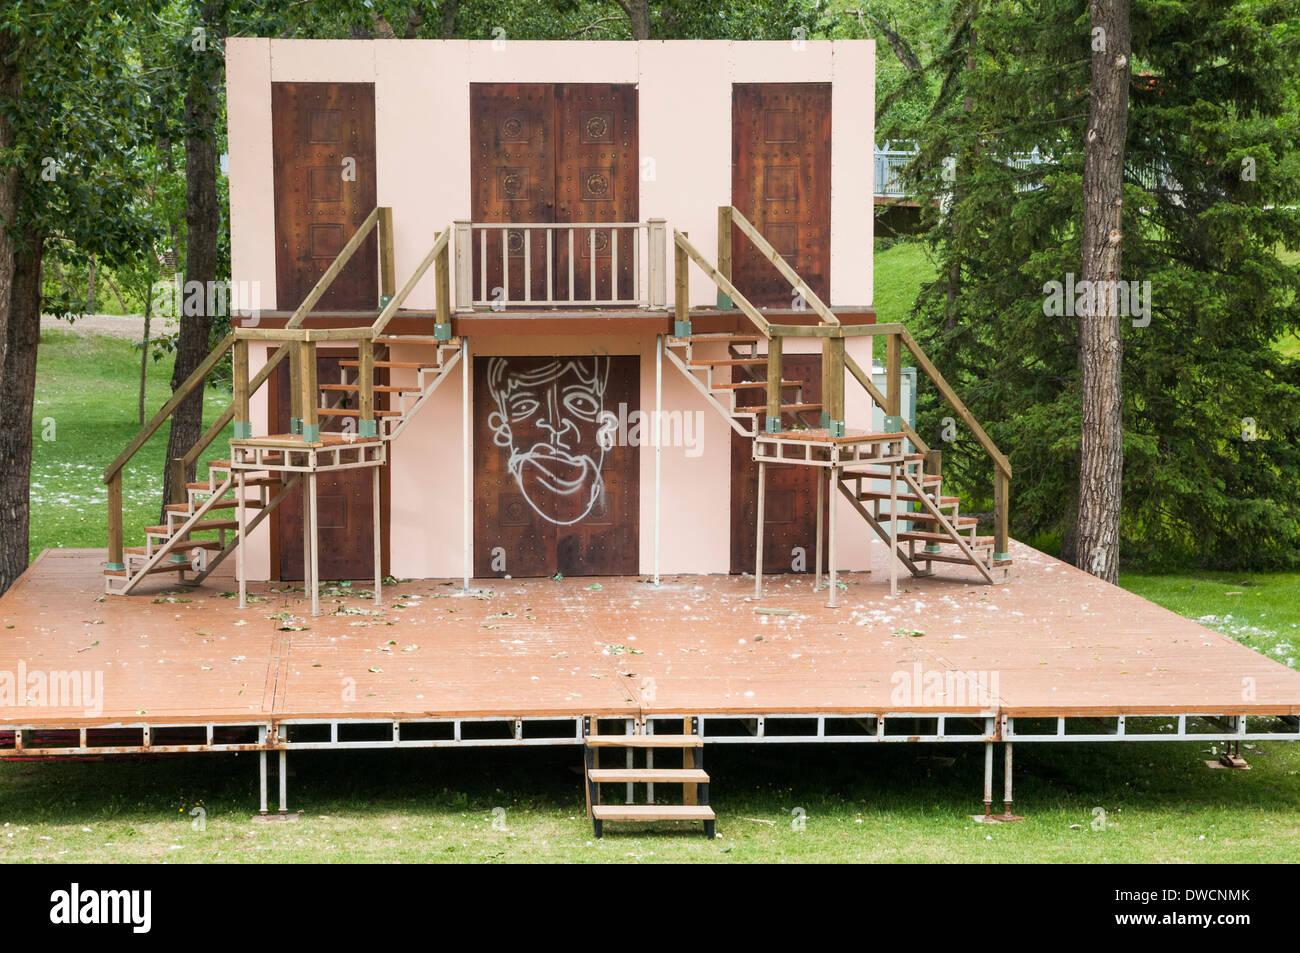 Theater stage, Prince's Island Park, Calgary, Alberta, Canada - Stock Image